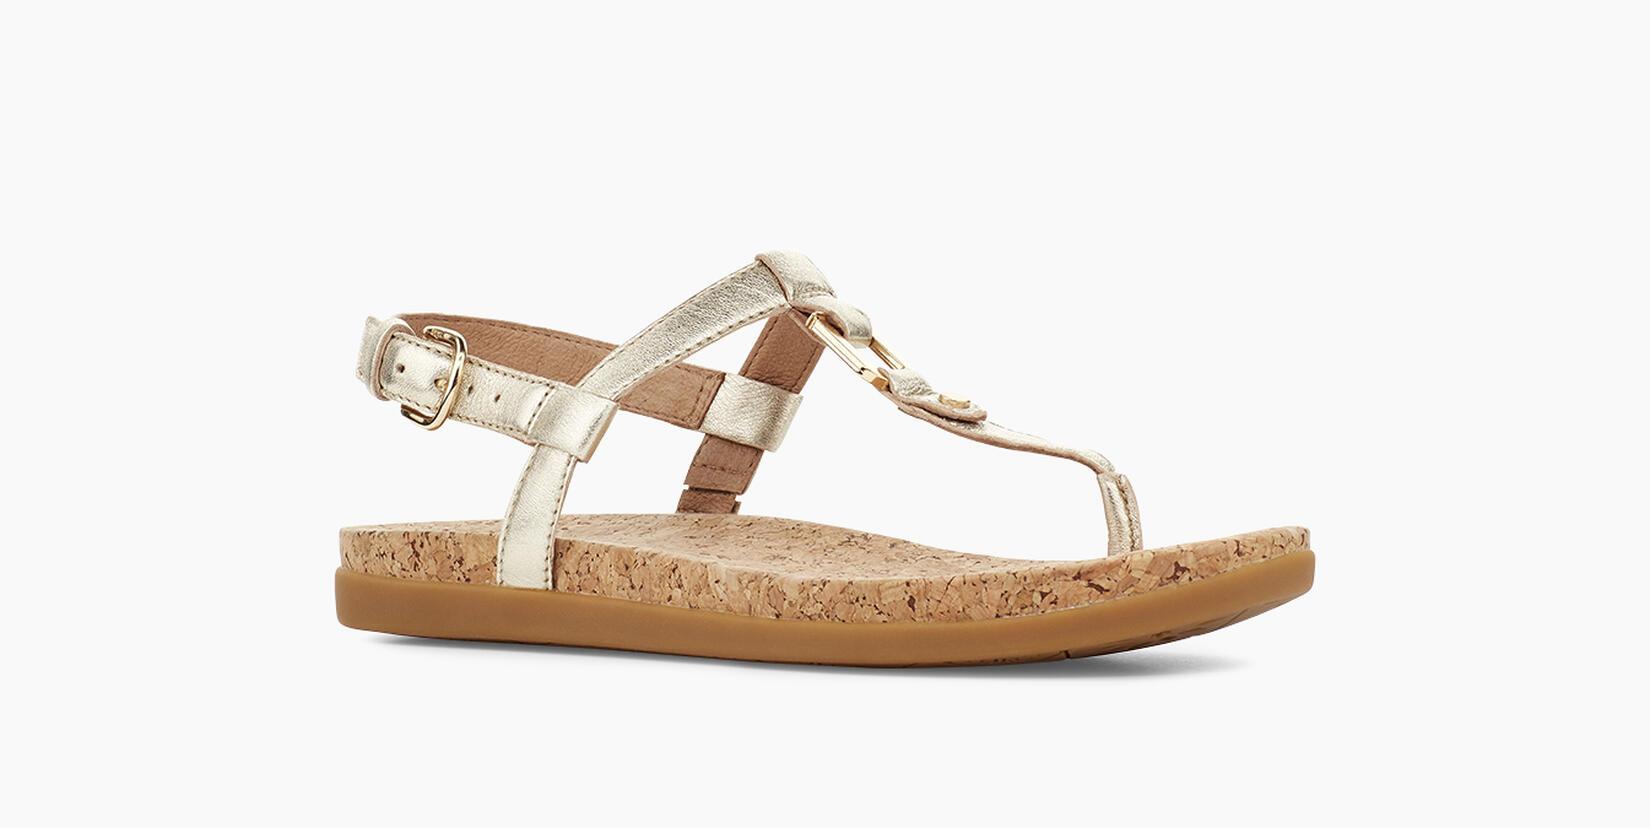 Aleigh Sandal